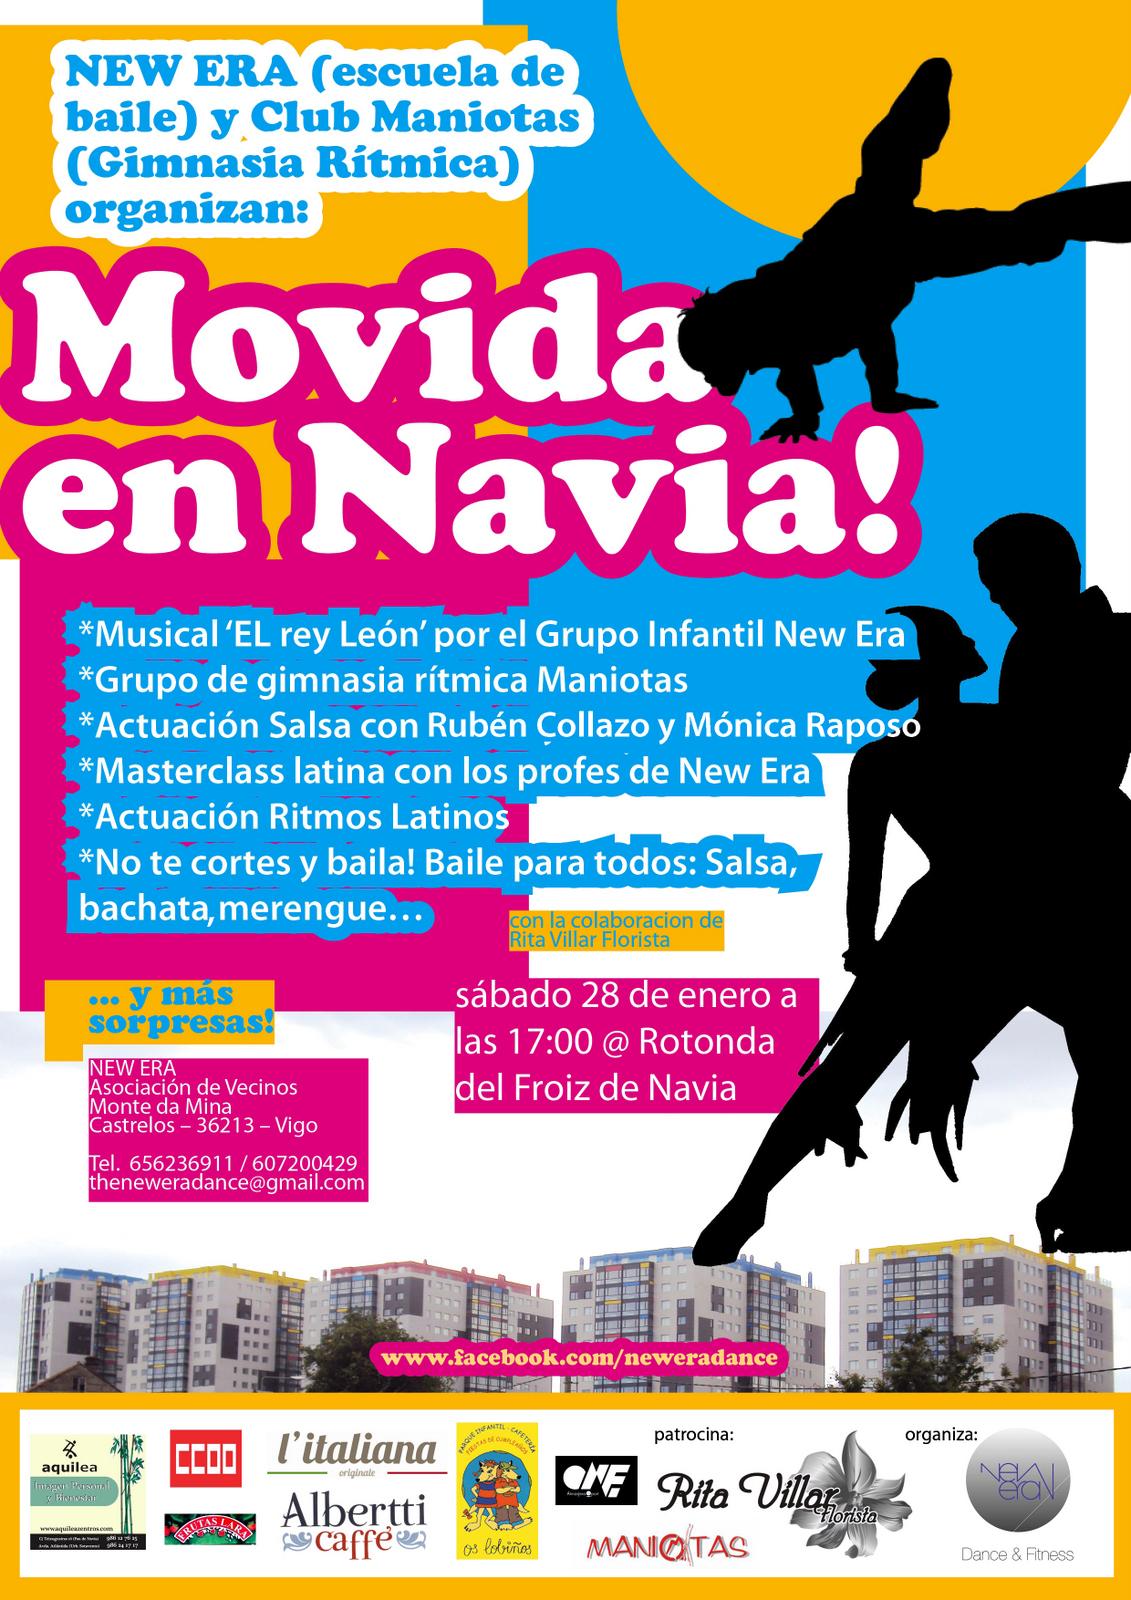 Movida en Navia!